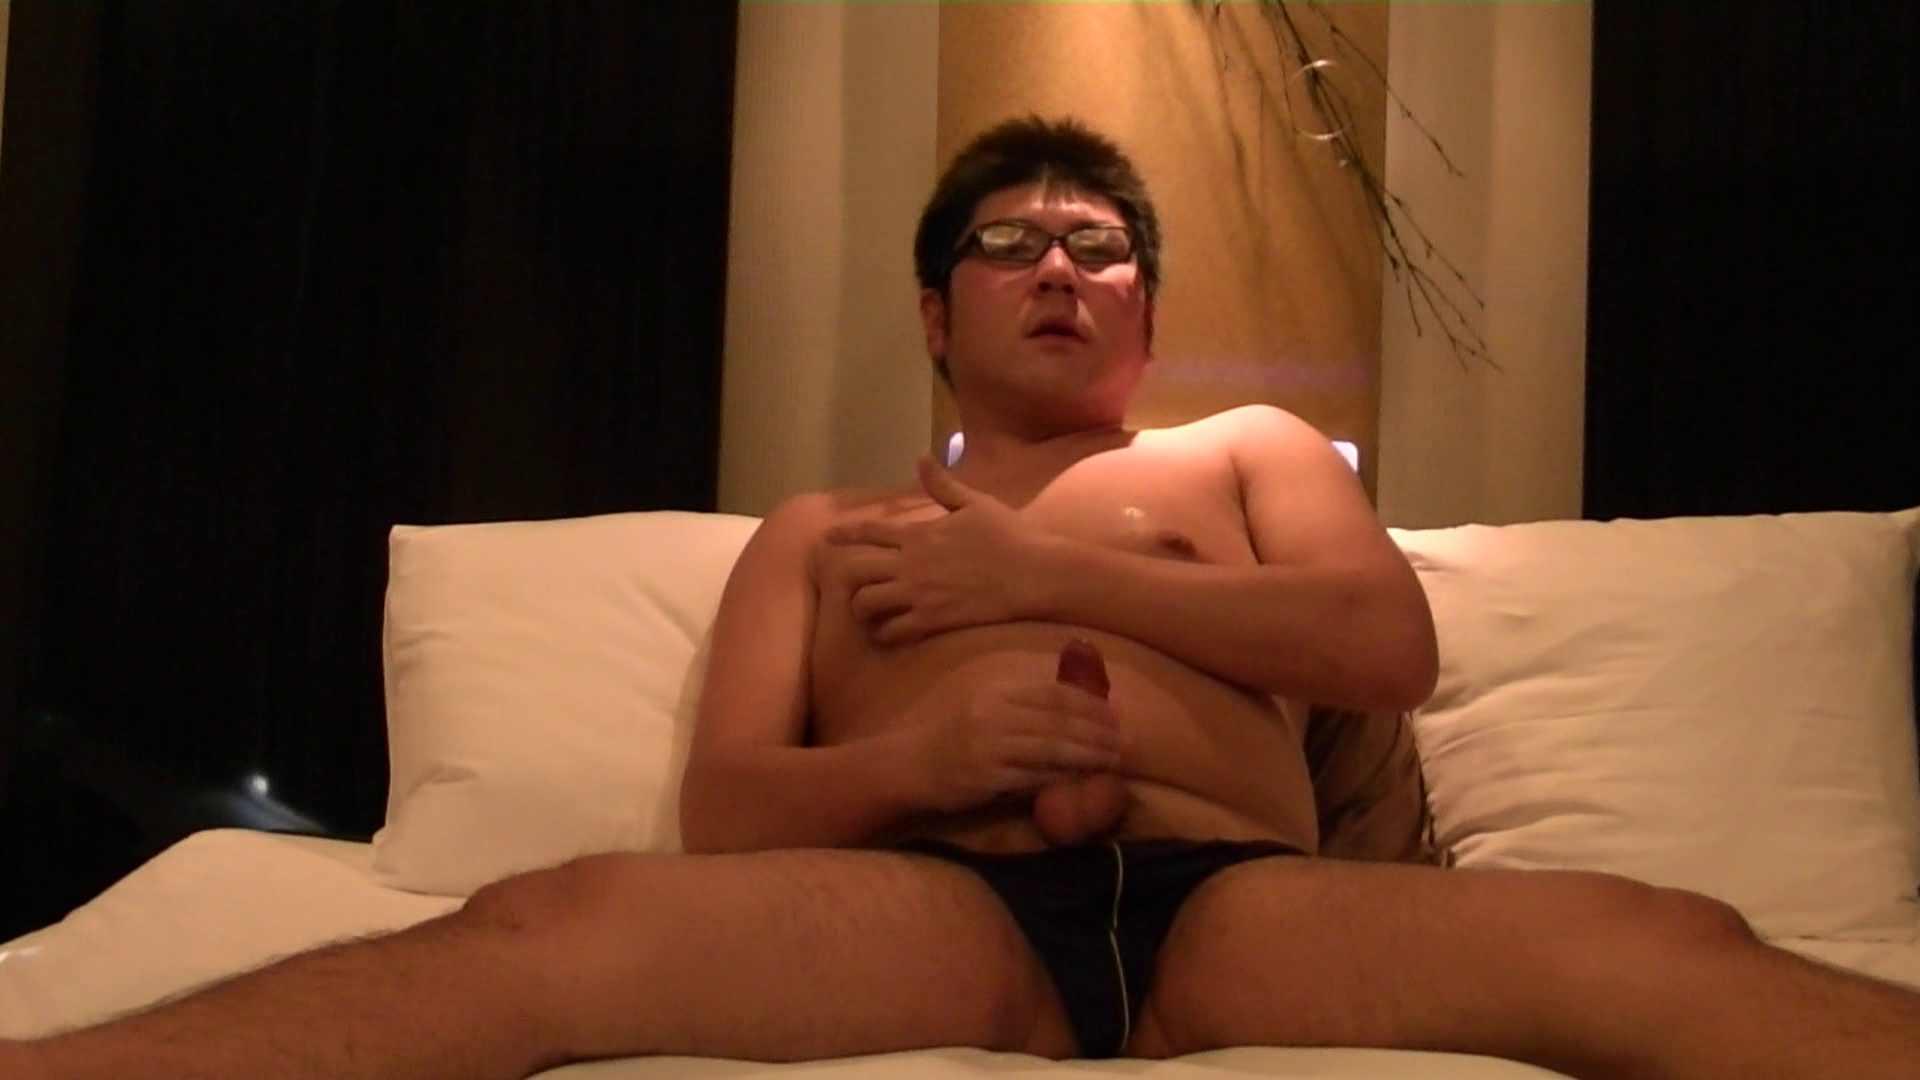 Mr.オナックスさん投稿!HD 貴方のオナニー三万円で撮影させてください。VOL.02 前編 0 | オナニー特集  72pic 47